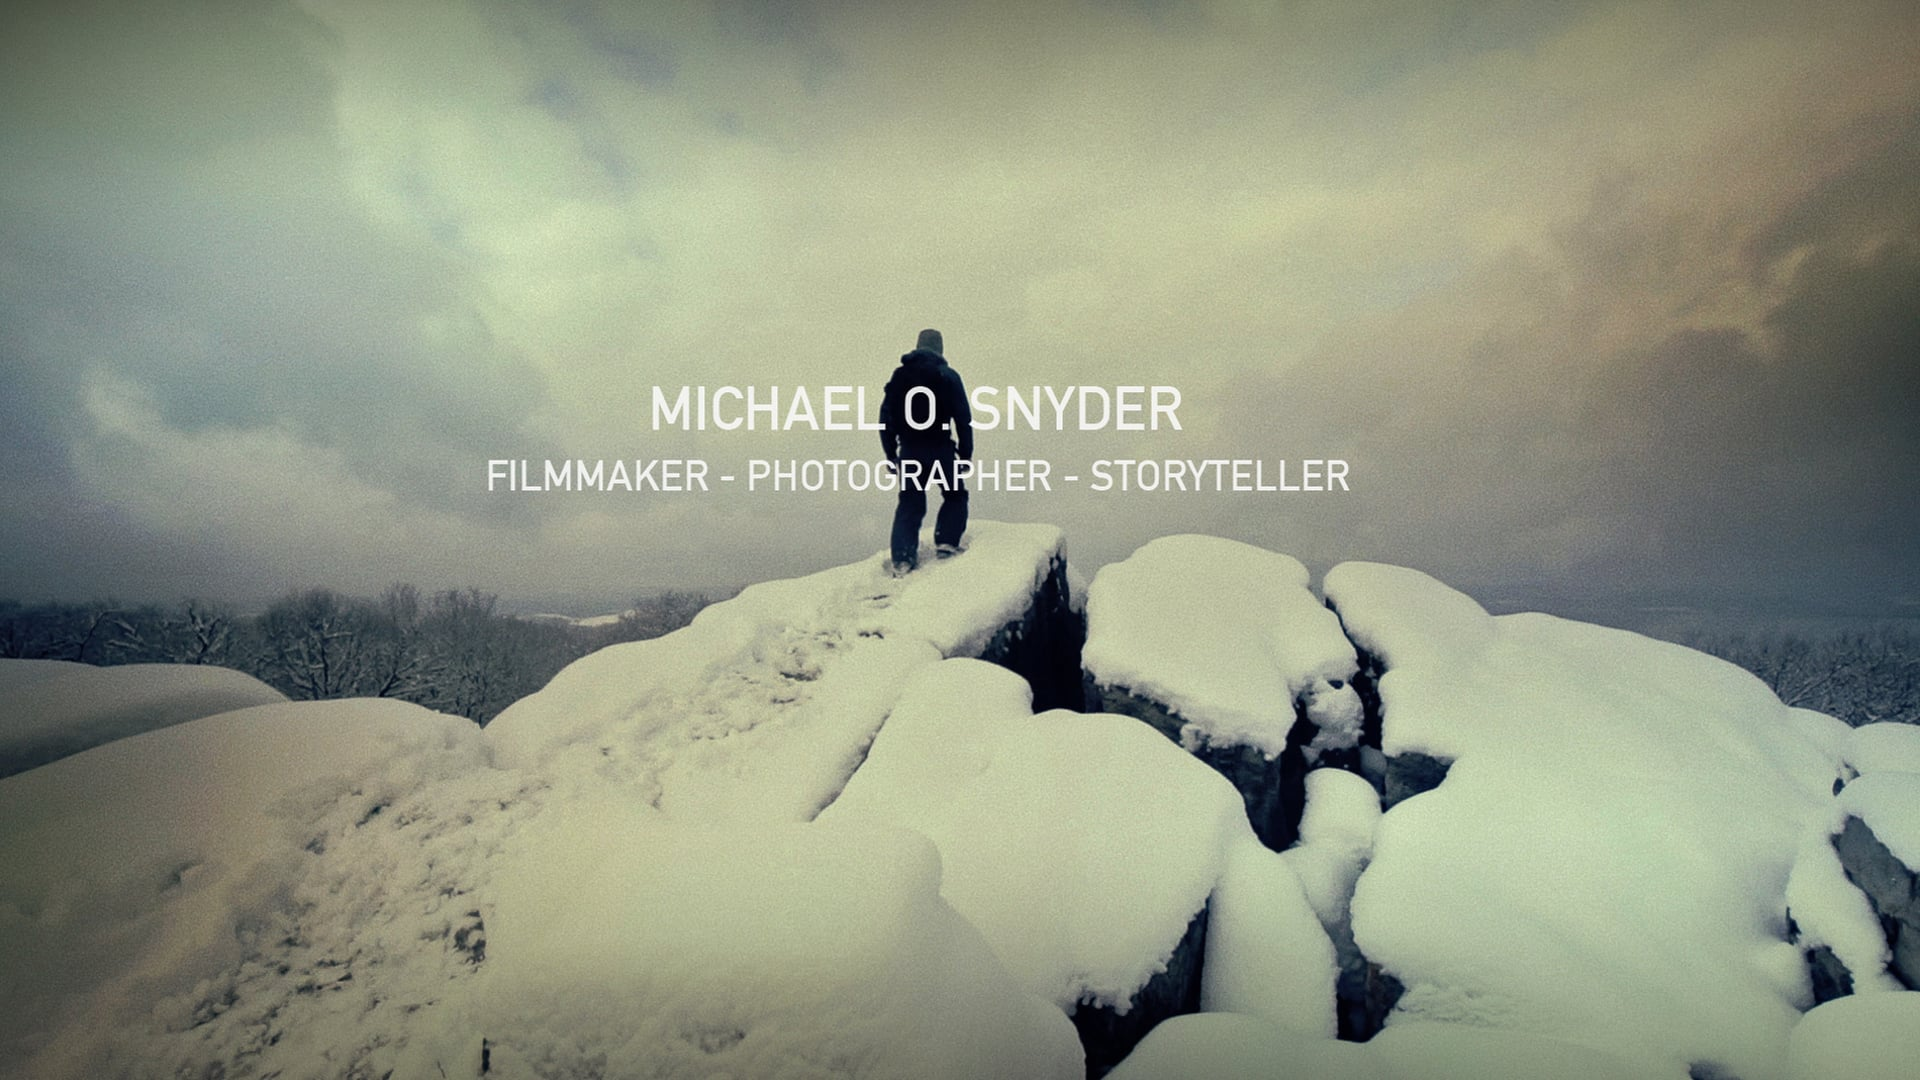 Michael O. Snyder - Director's Reel